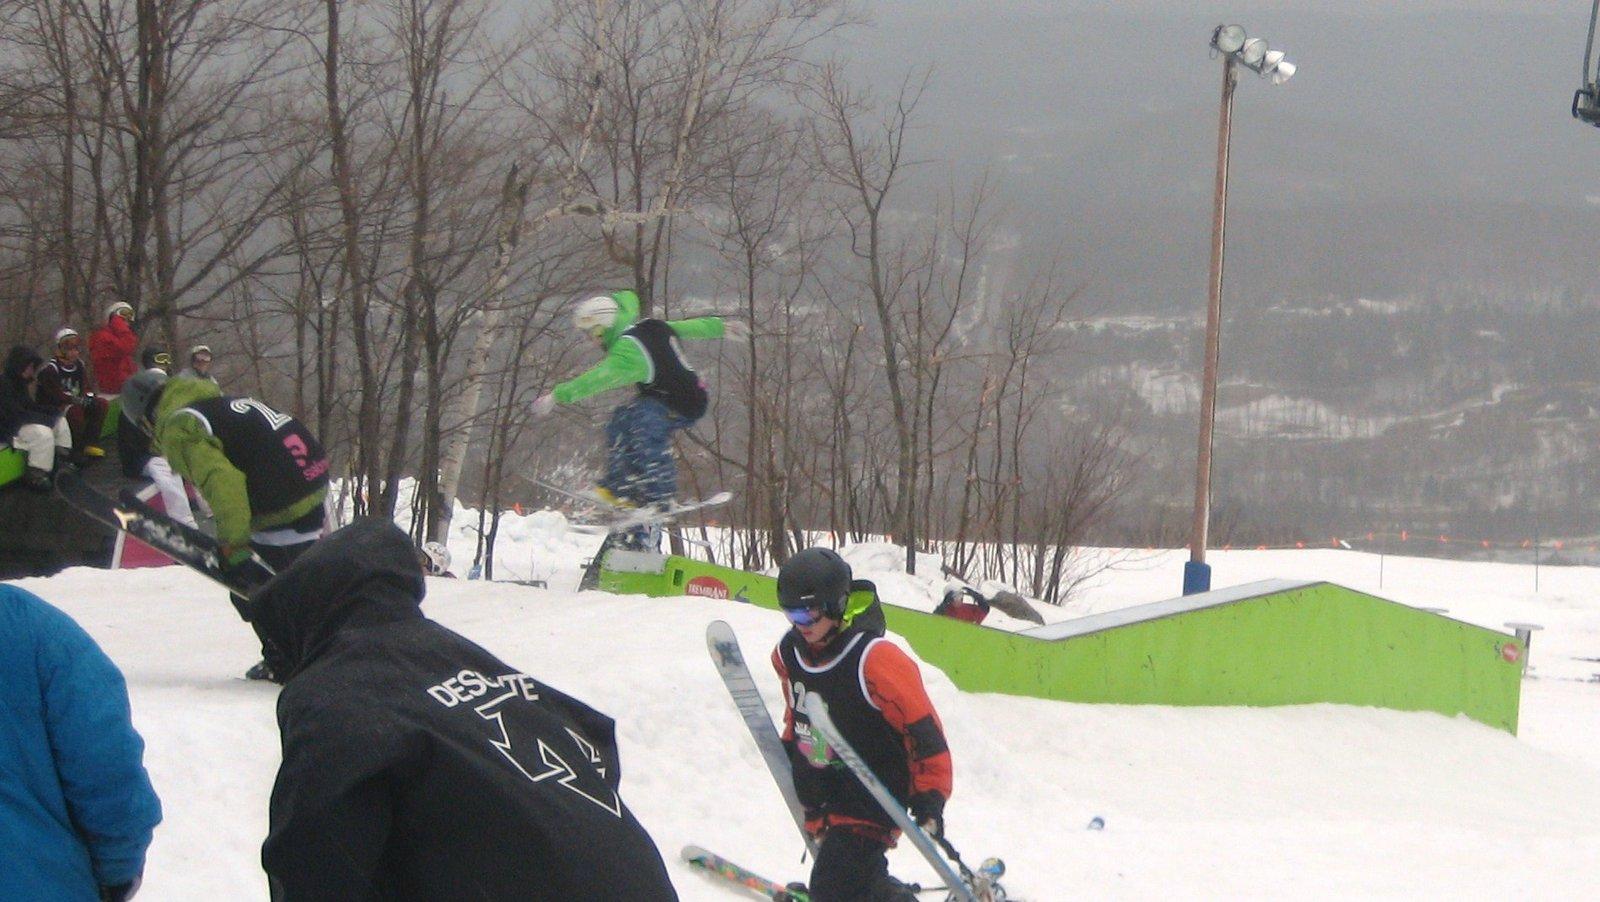 Ski free - 1 of 2